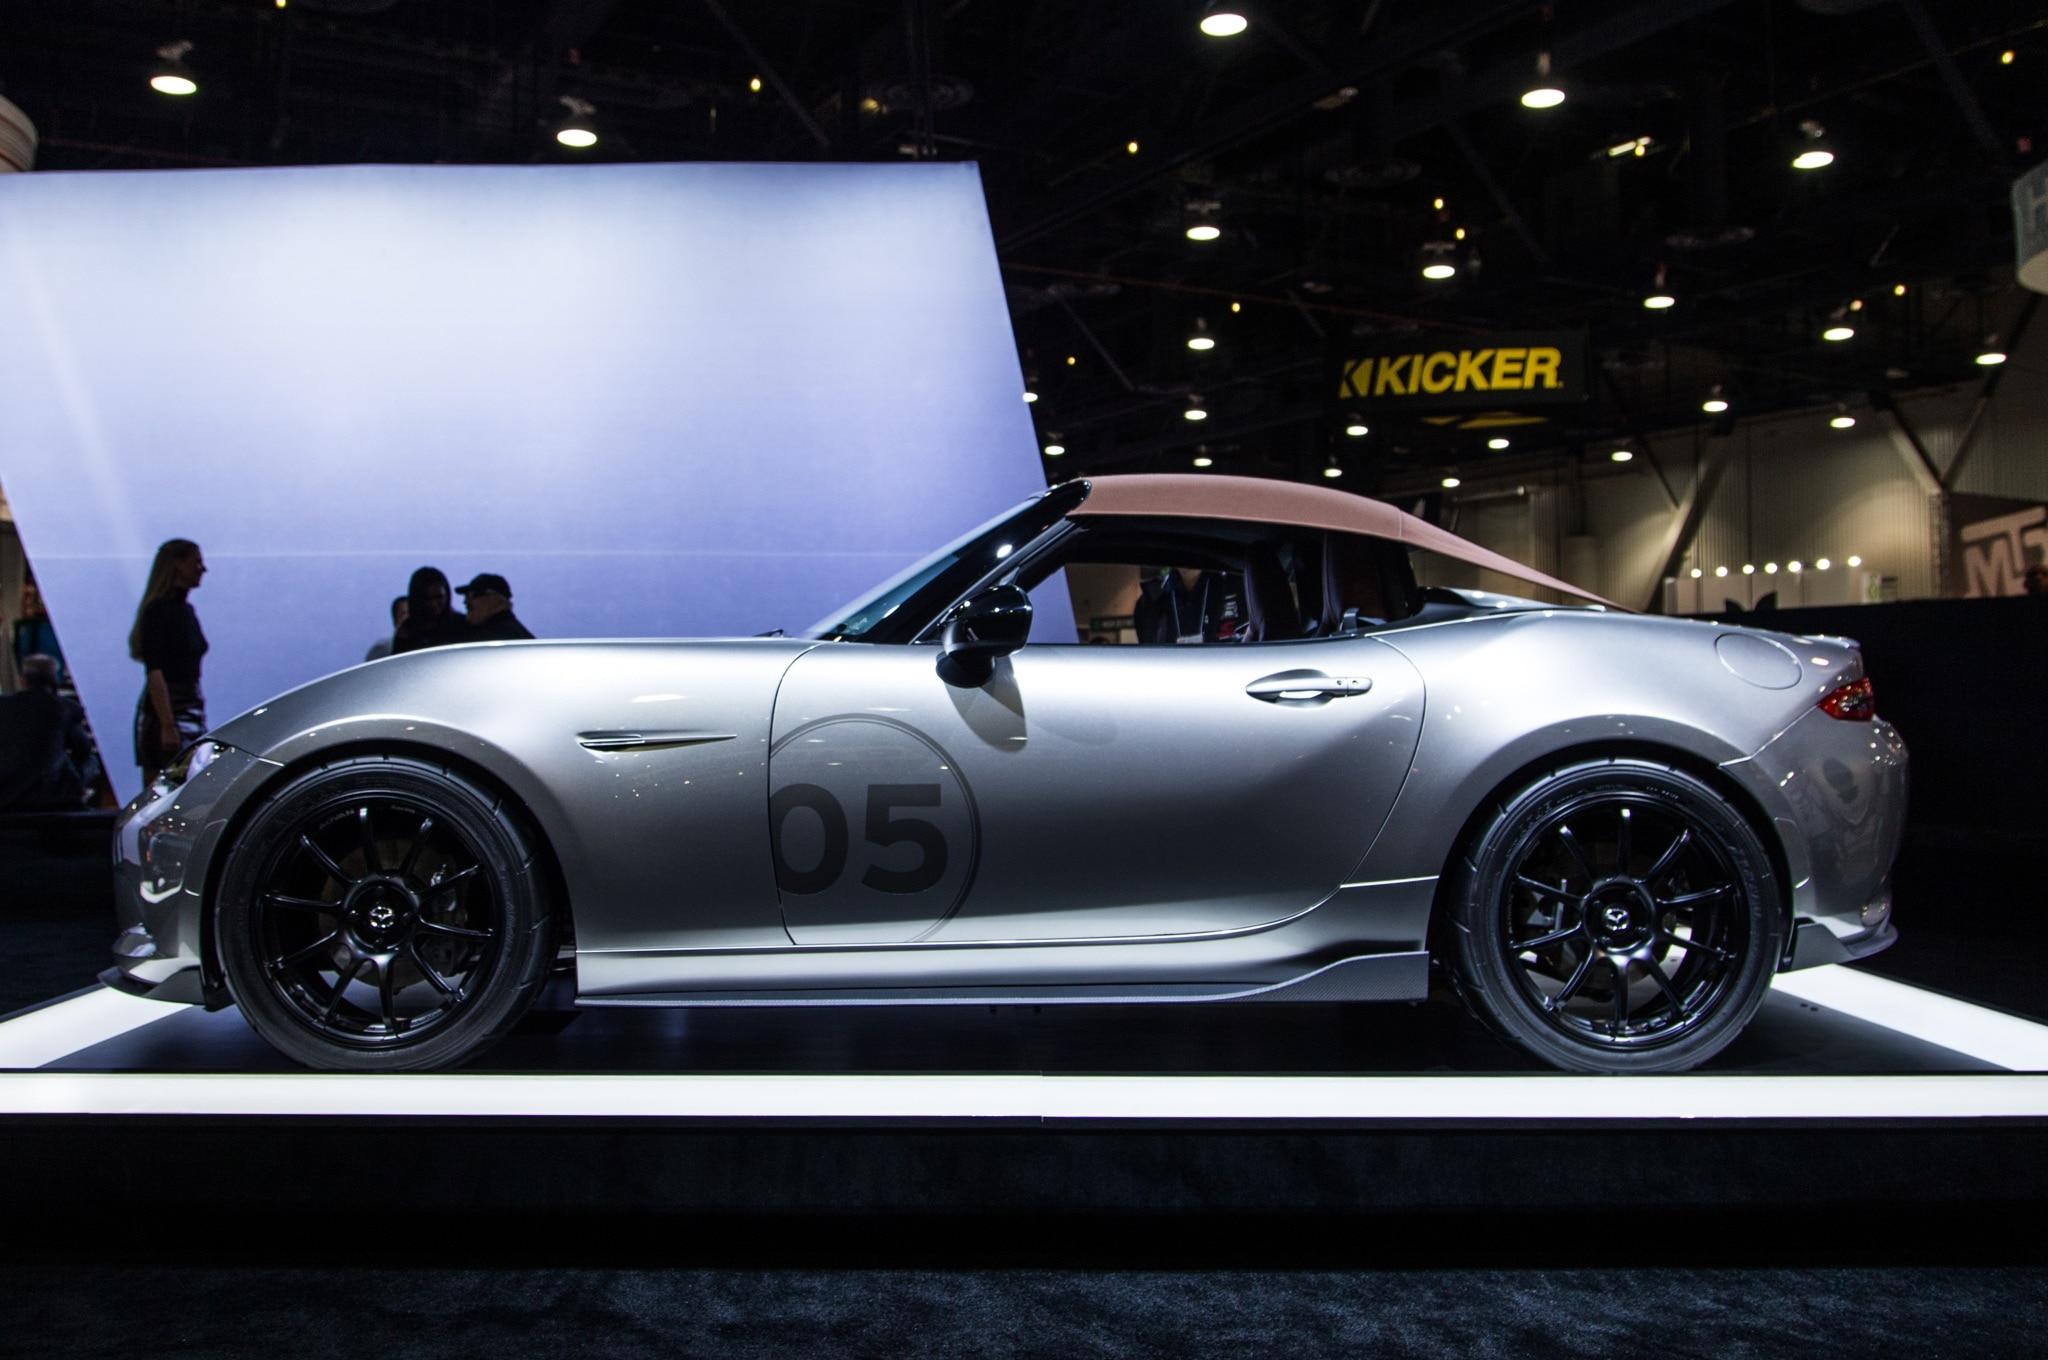 2016 Mazda MX-5 Miata Spyder, Speedster Concepts Shed Weight at SEMA